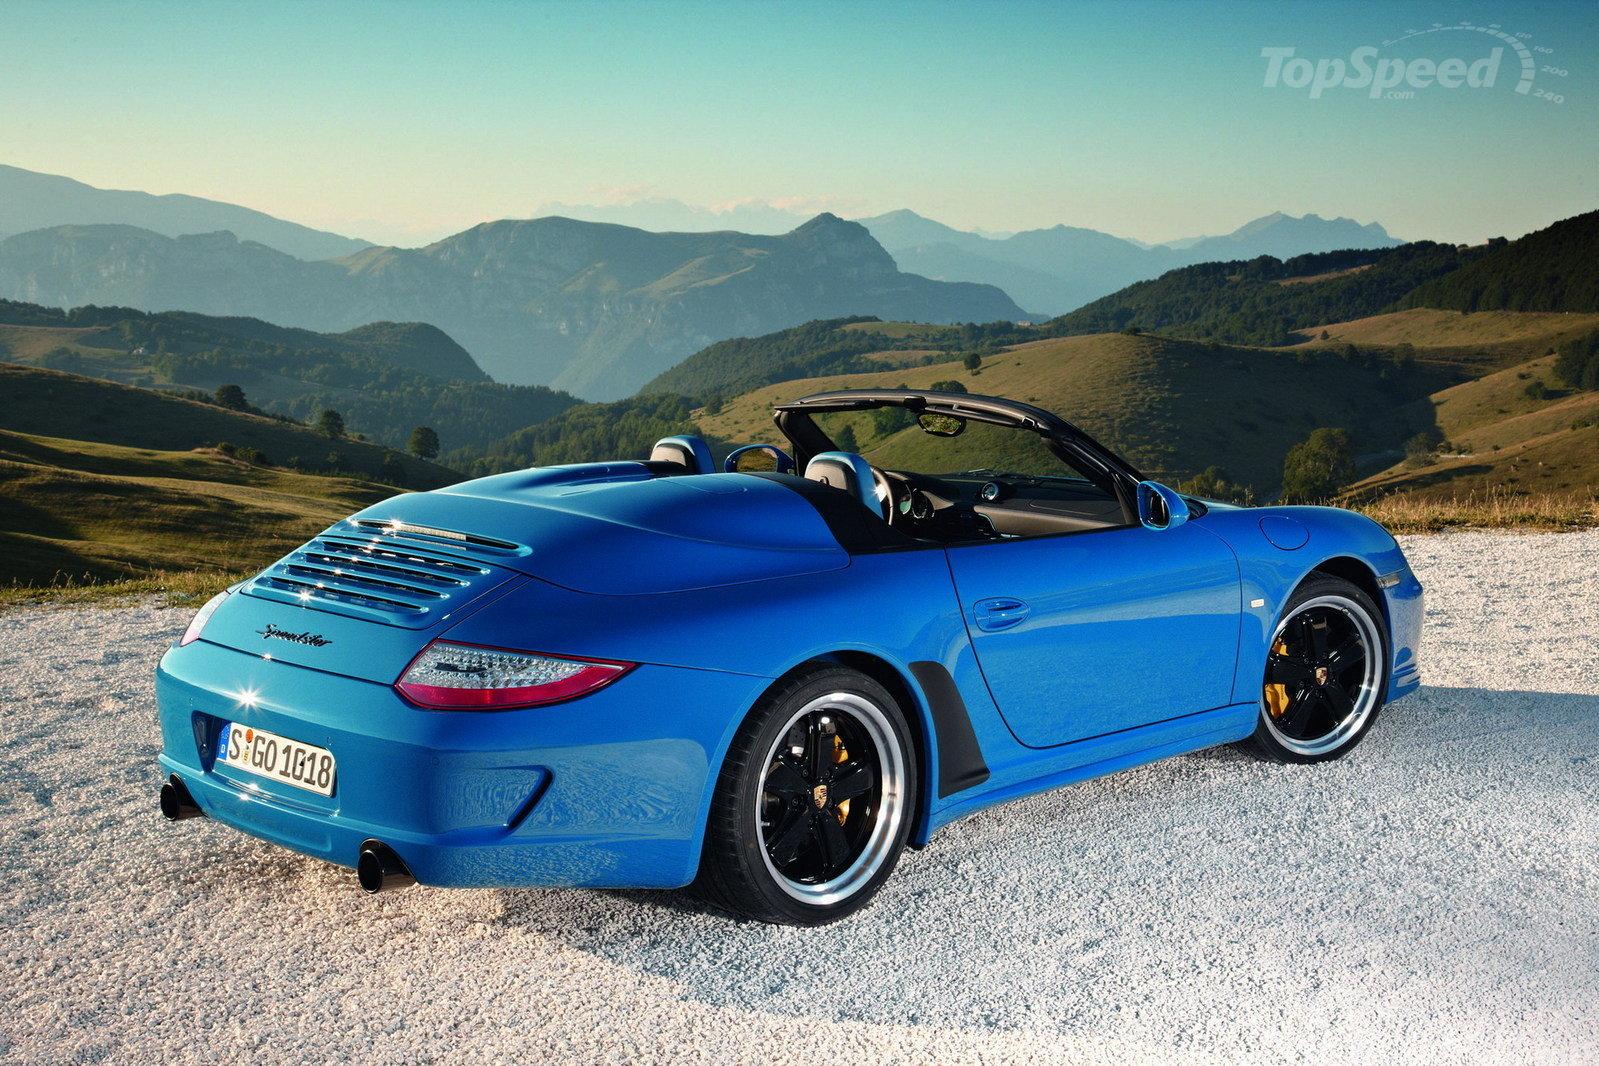 2010 Porsche 911 Speedster Wallpapers